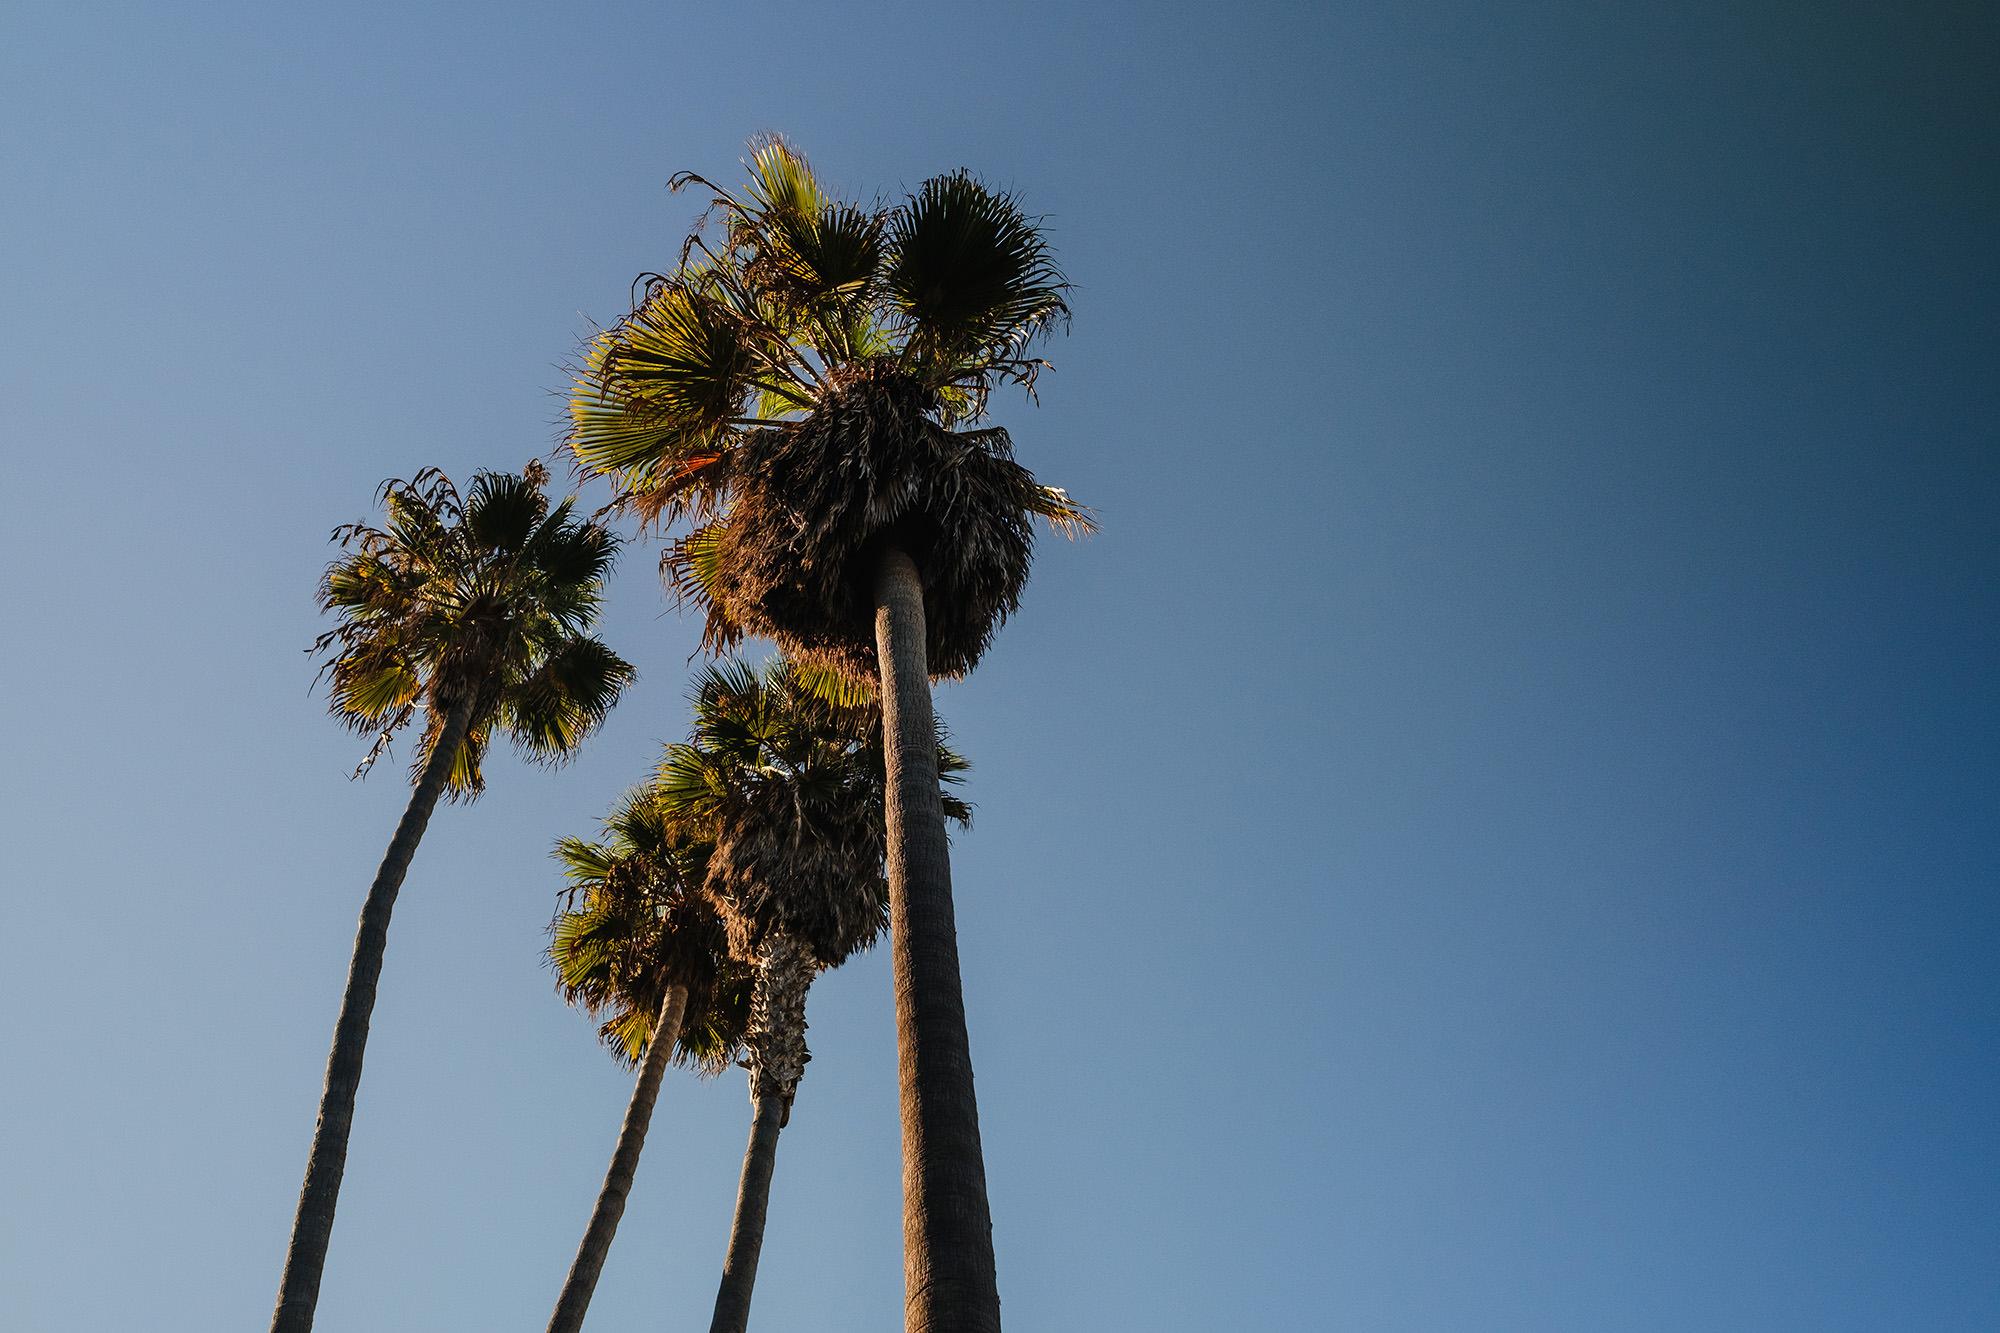 Travelling through California in November